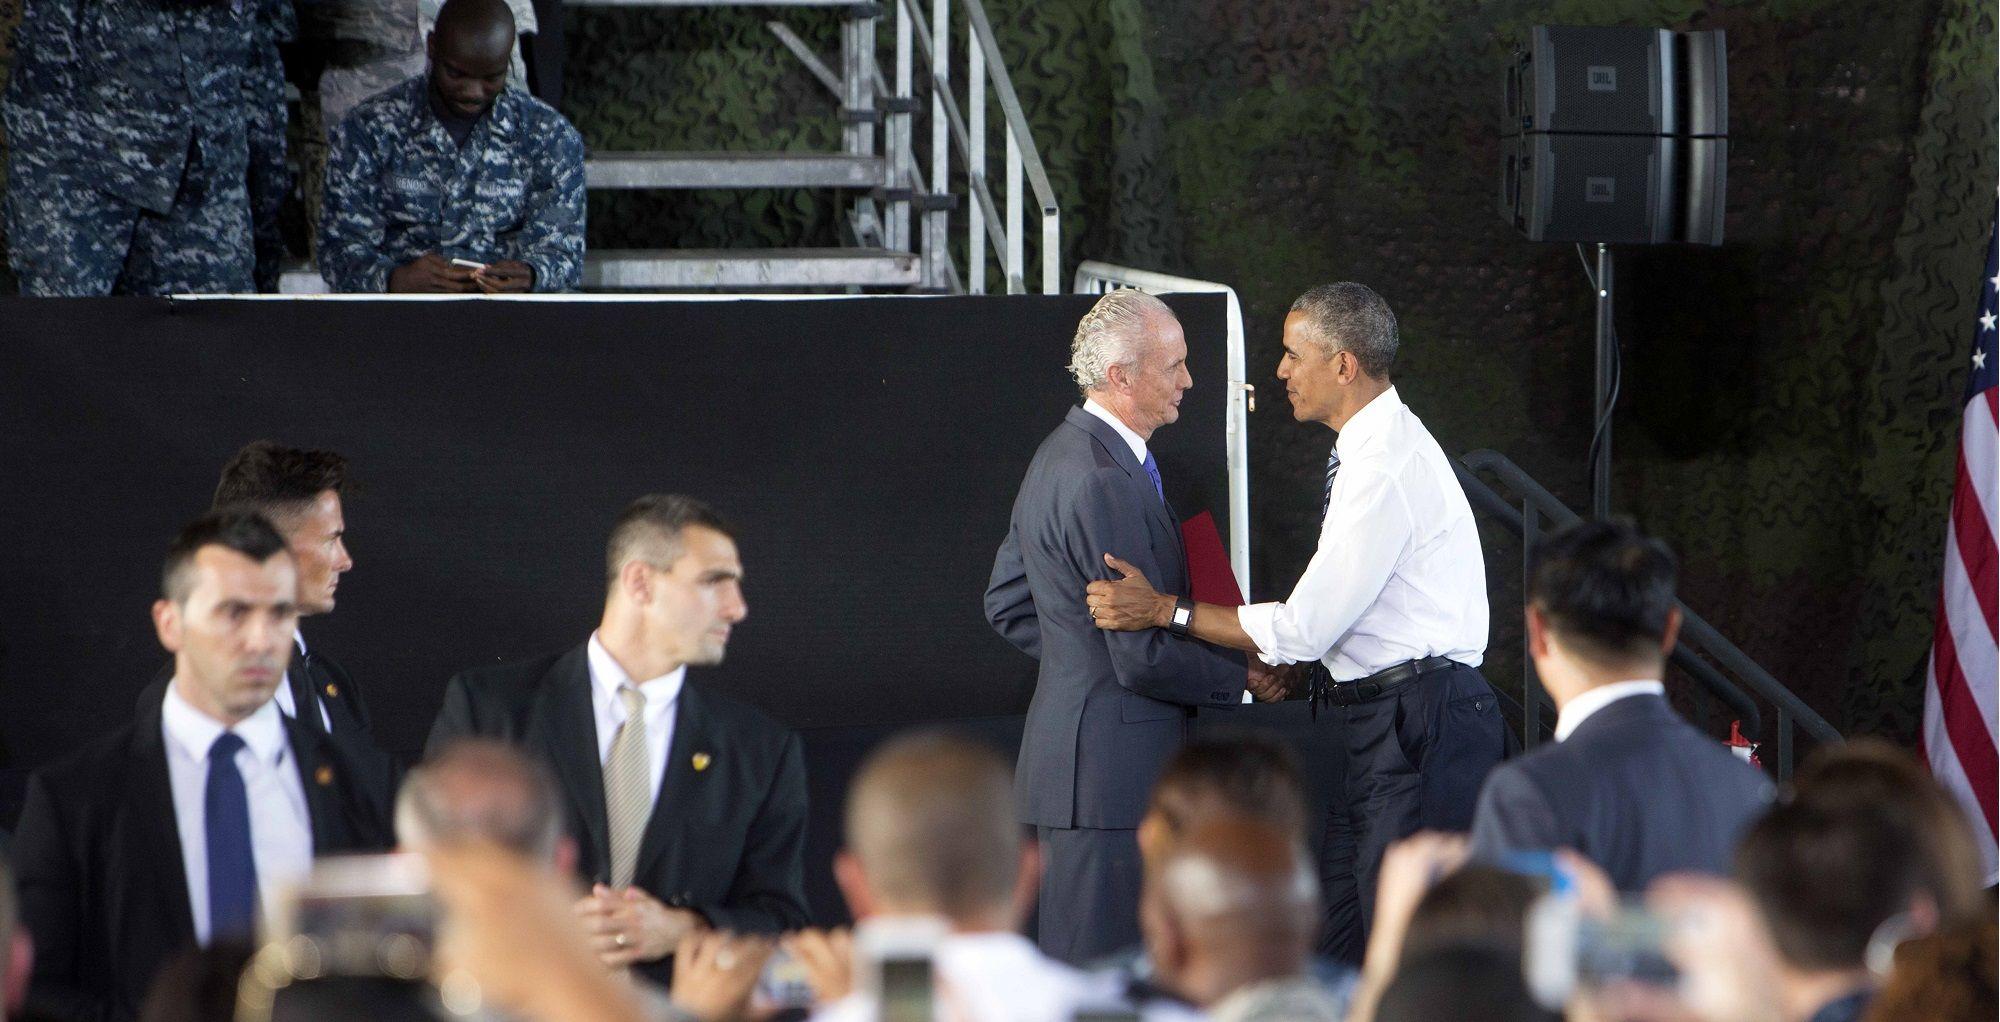 Barack Obama, presidente de los Estados Unidos de América, saludando a Pedro Morenés, ministro de Defensa de España, en la Base Naval de Rota, 10JUL2016 | Juan Carlos Corchado para MIRA Jerez